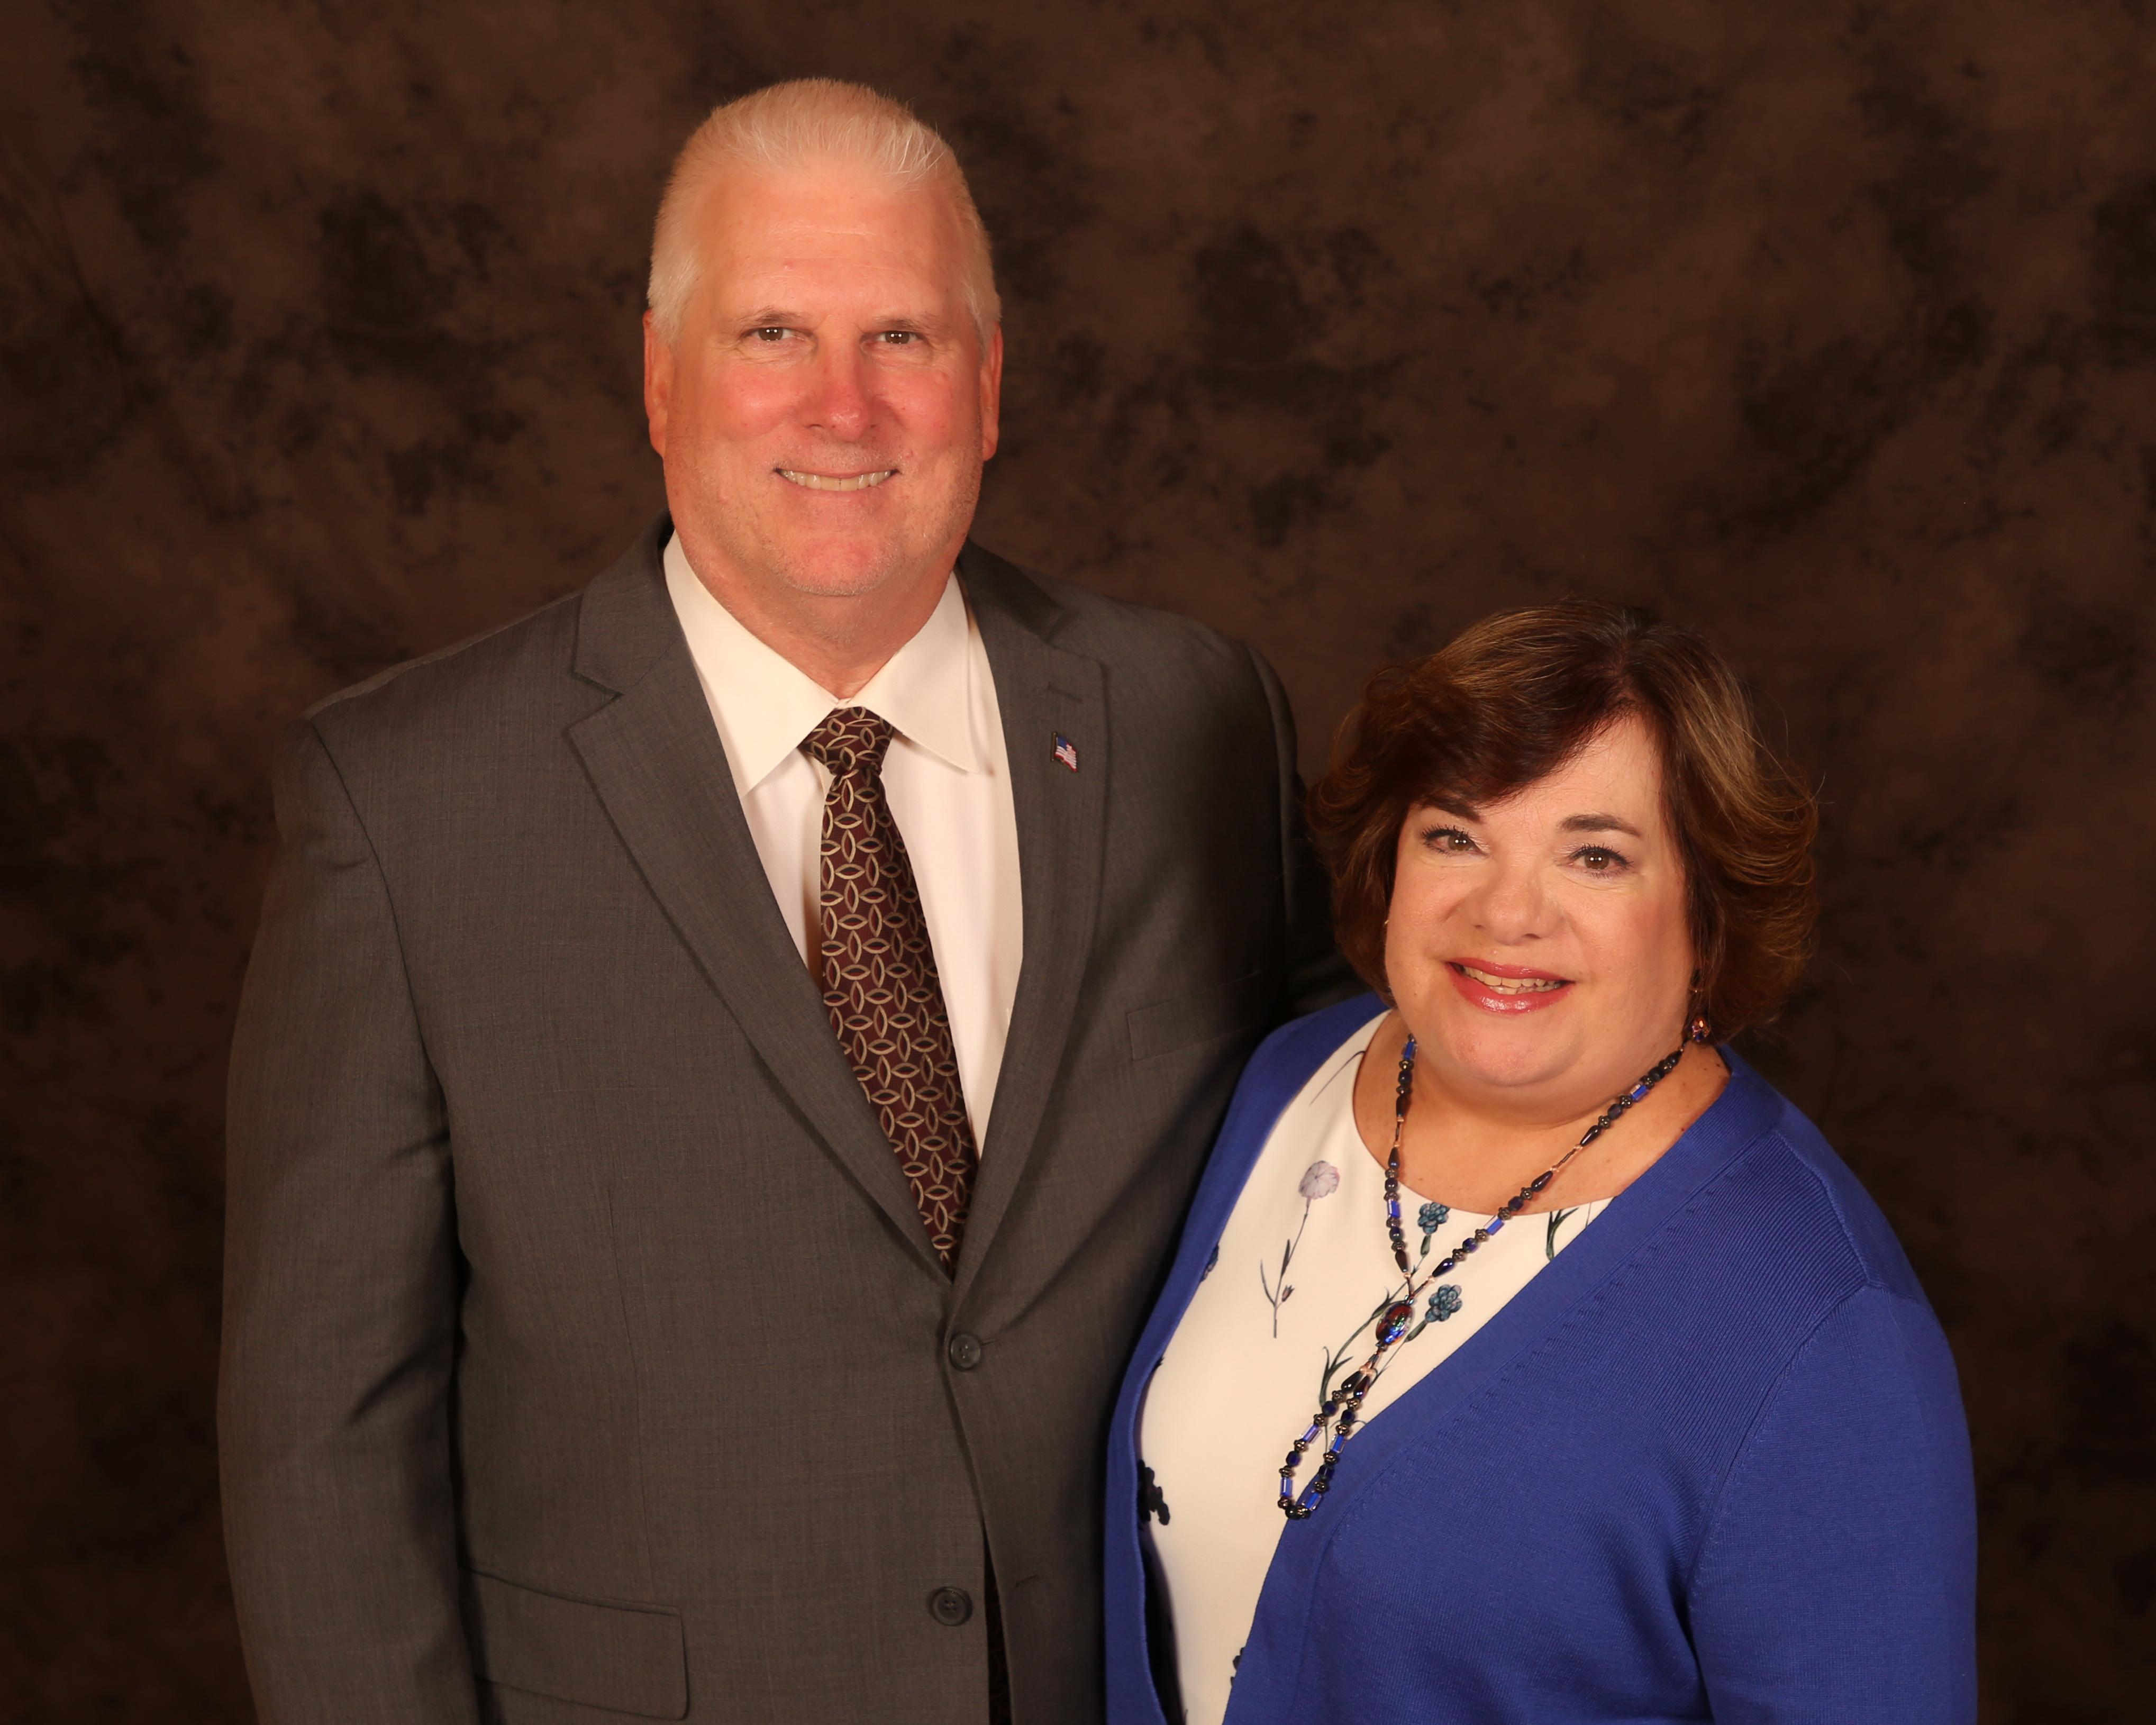 Franchise Owner Profile: Dan and Jill Parker